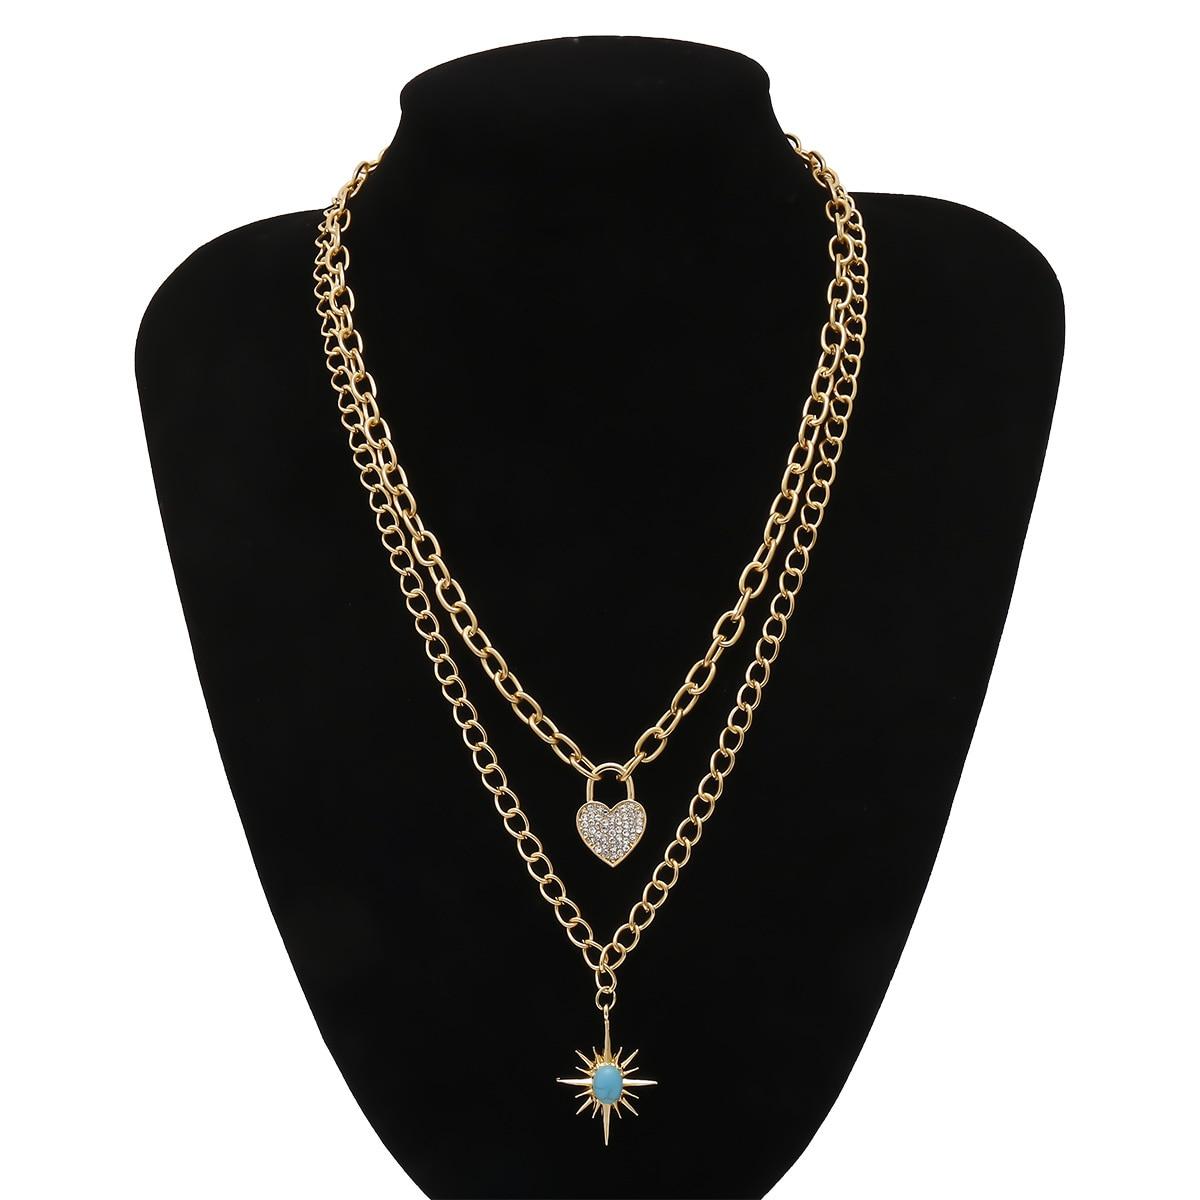 Retro Stone Sun Shape Pendant Necklace Rhinestone Heart Necklaces for Women Gold Color 2020 Fashion Jewelry Clavicle Chains New